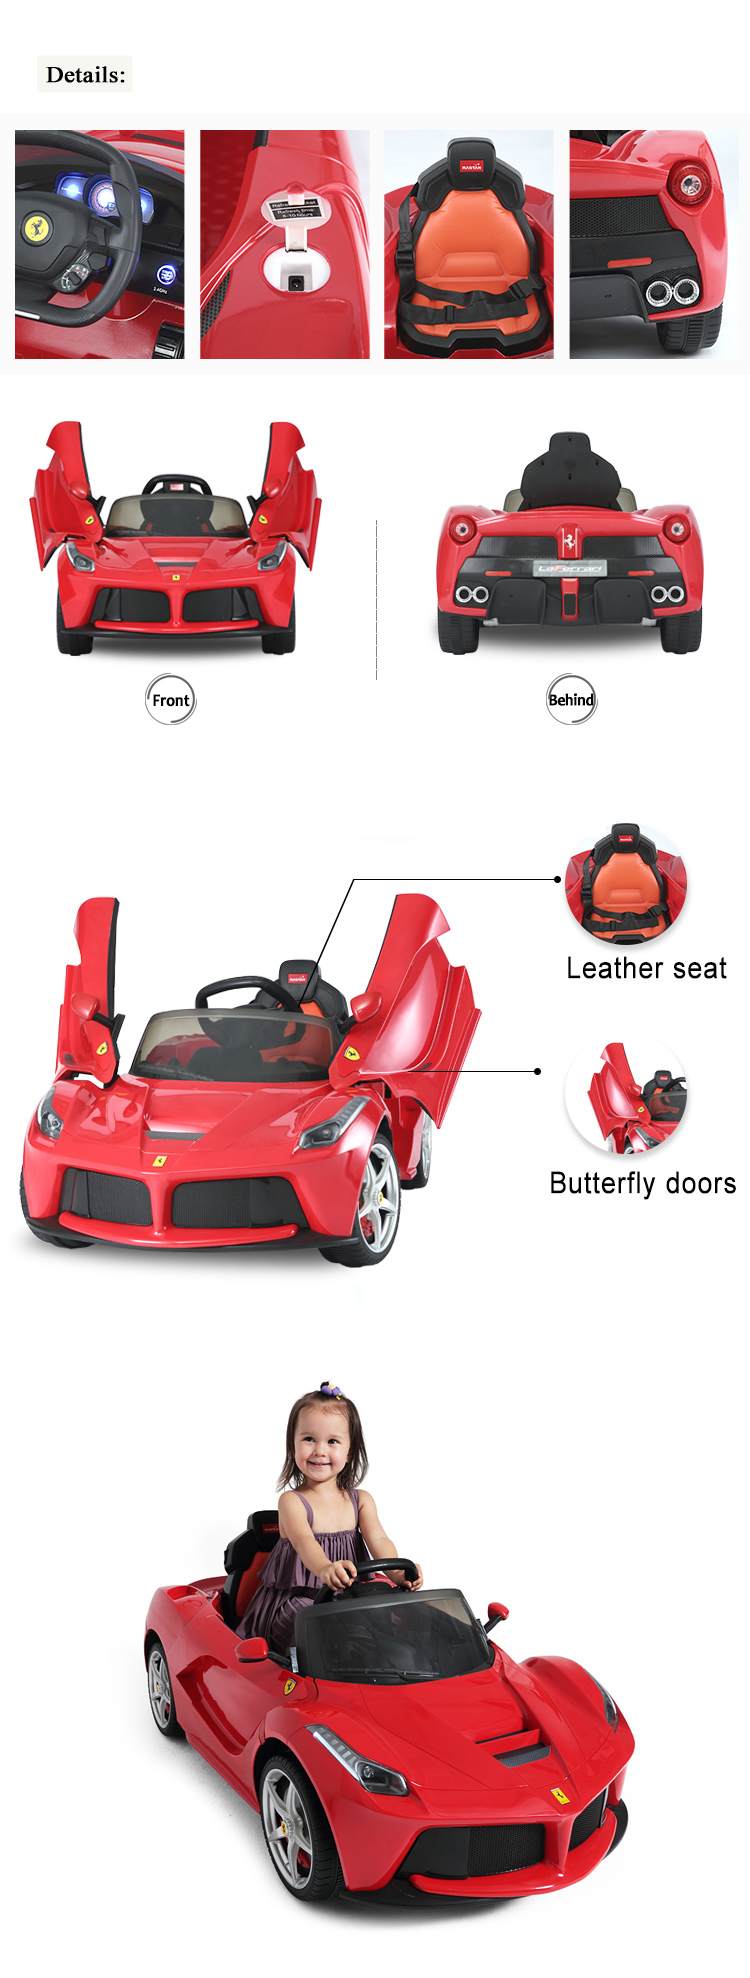 Rastar shopping toy Ferrari licenced LaFerrari ride on car toys for kids